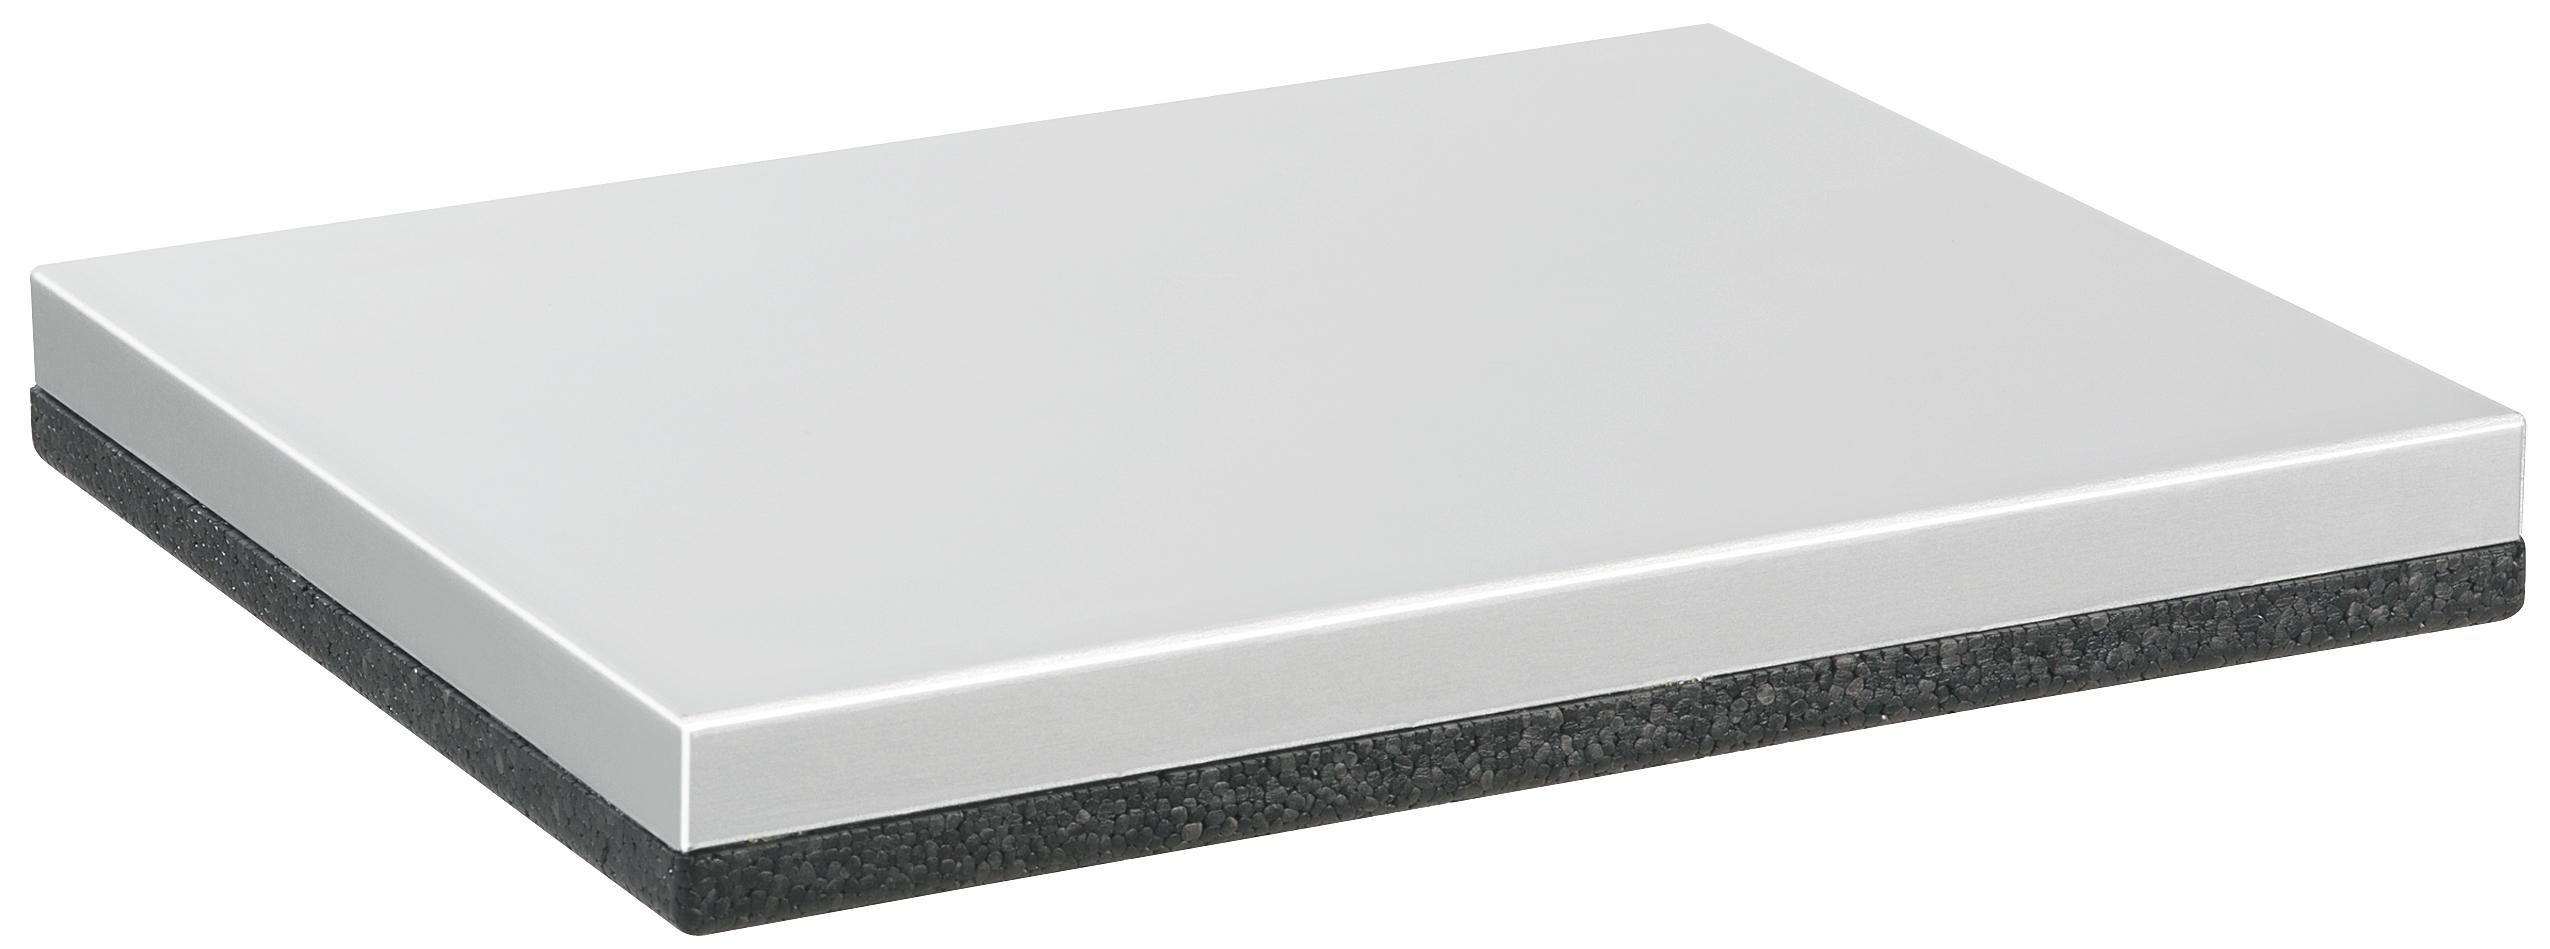 Icetainer Kylbricka 32cm x 26cm